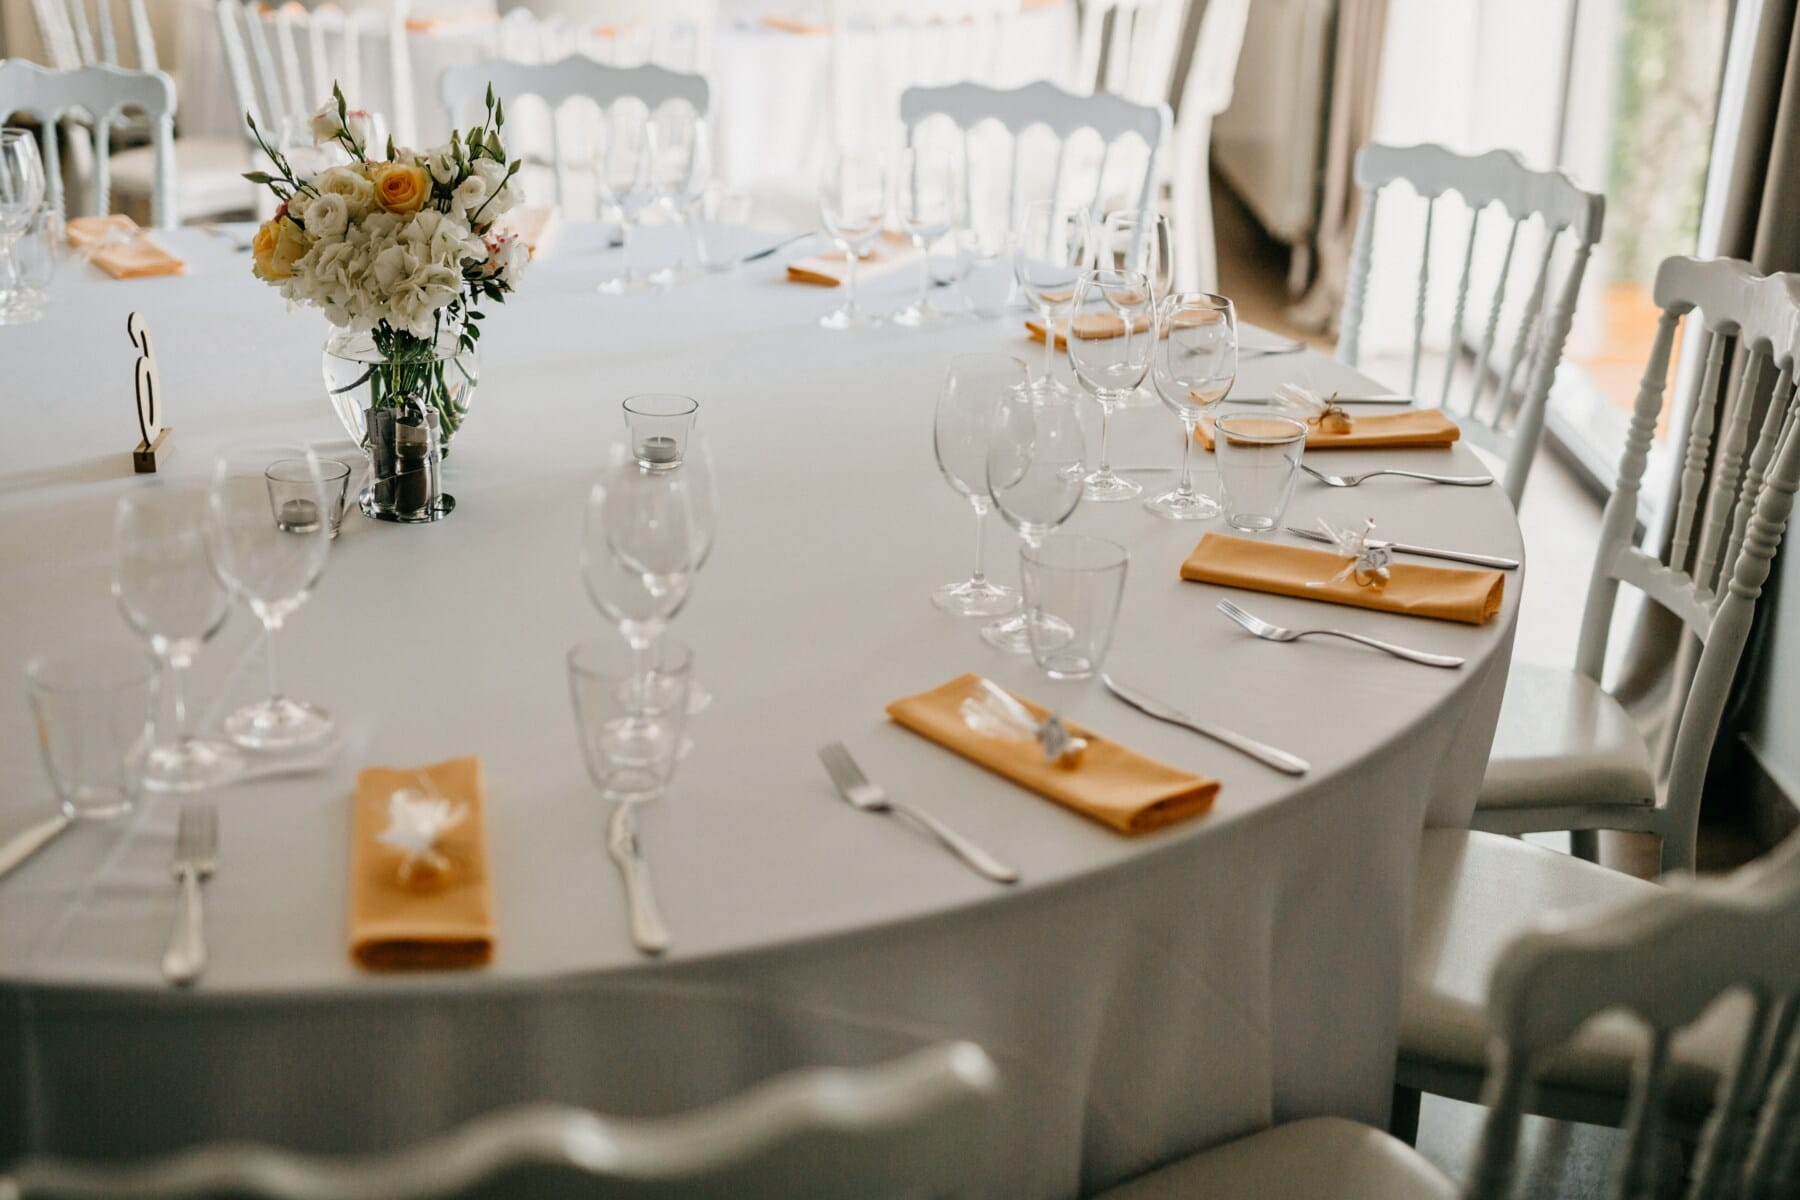 indoors, tableware, silverware, cutlery, wedding, table, dining, interior design, flatware, luxury